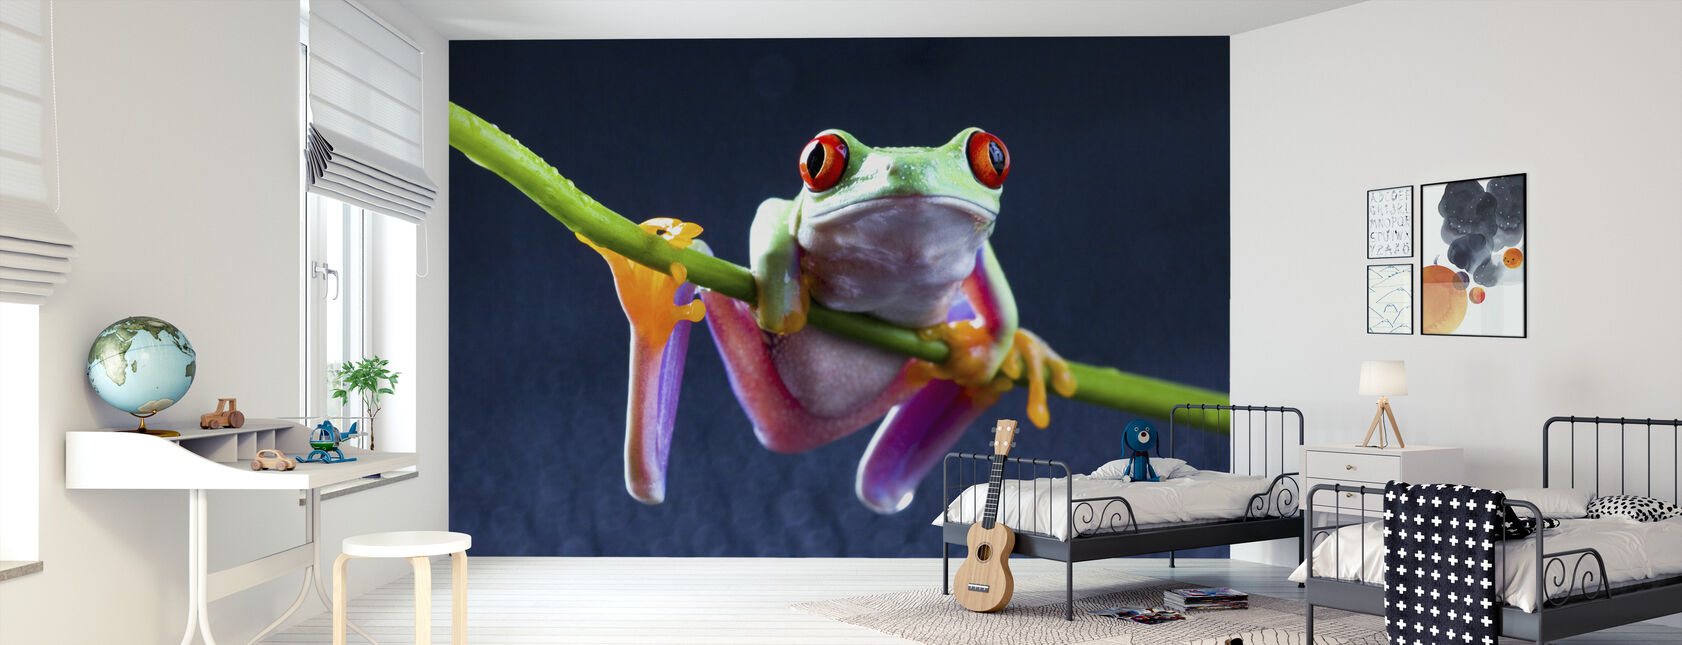 Red frog - Wallpaper - Kids Room